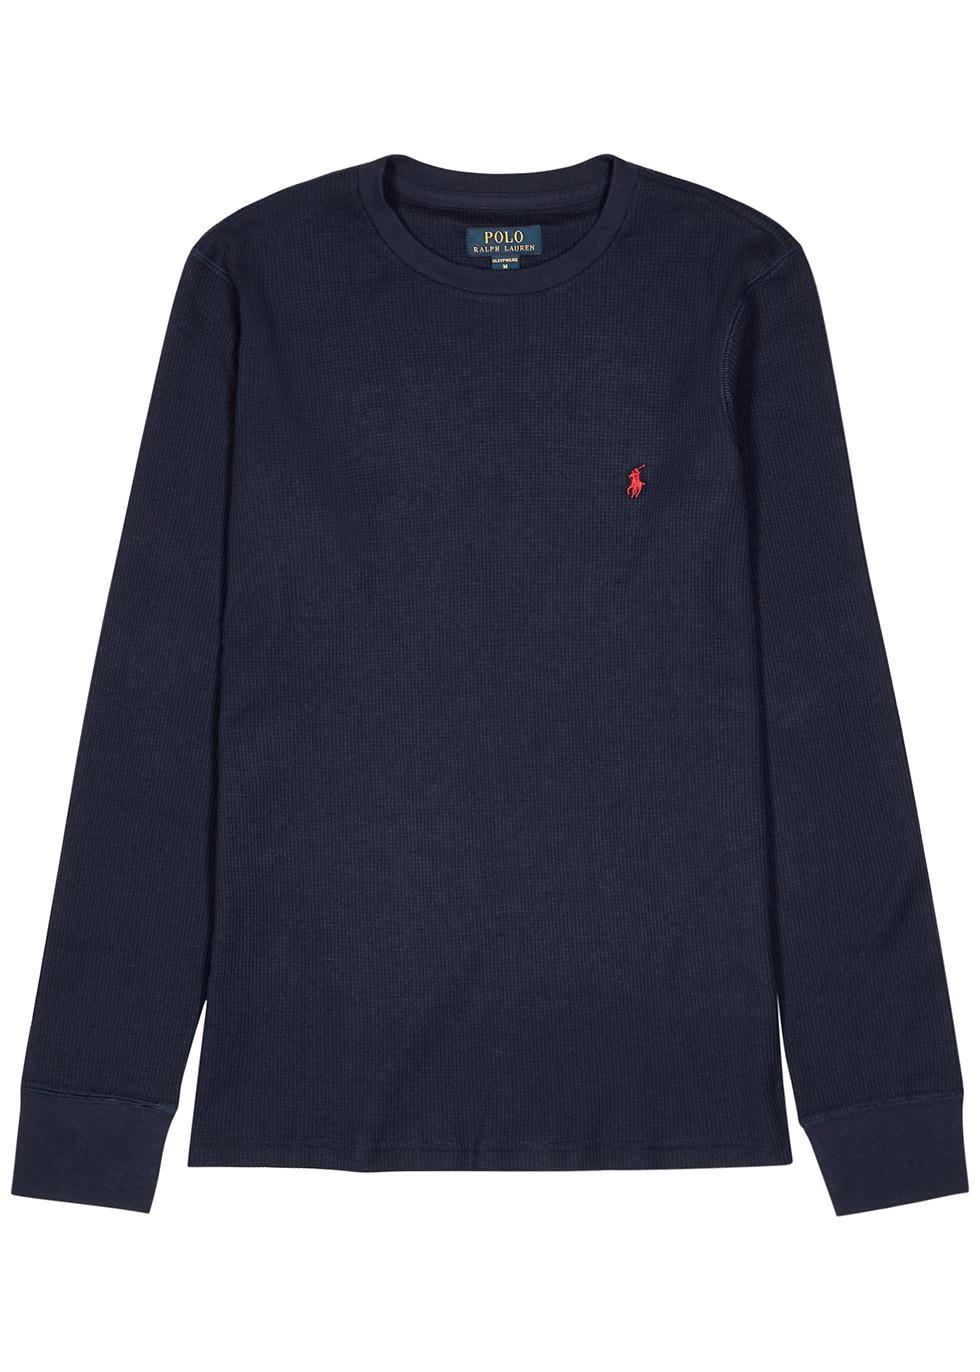 Navy cotton-blend top